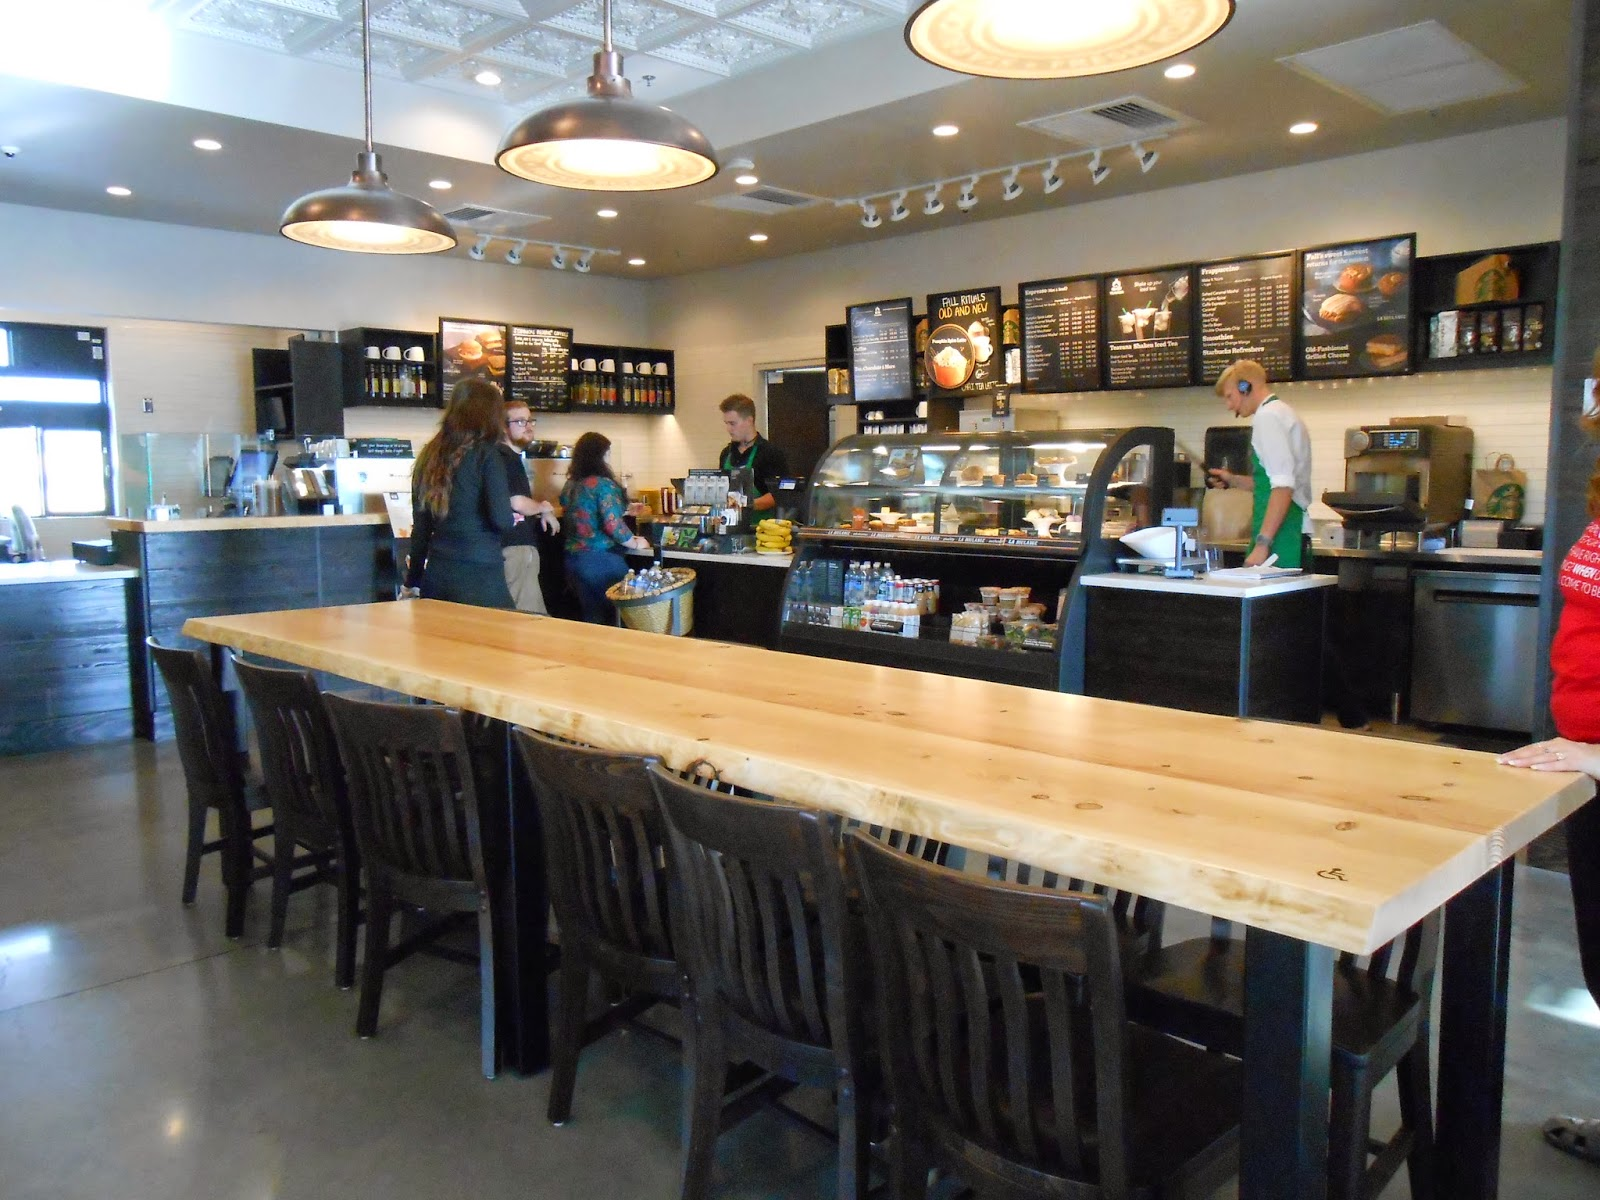 Hayden s Business Blog Starbucks Coffee in the Rocklin Crossings